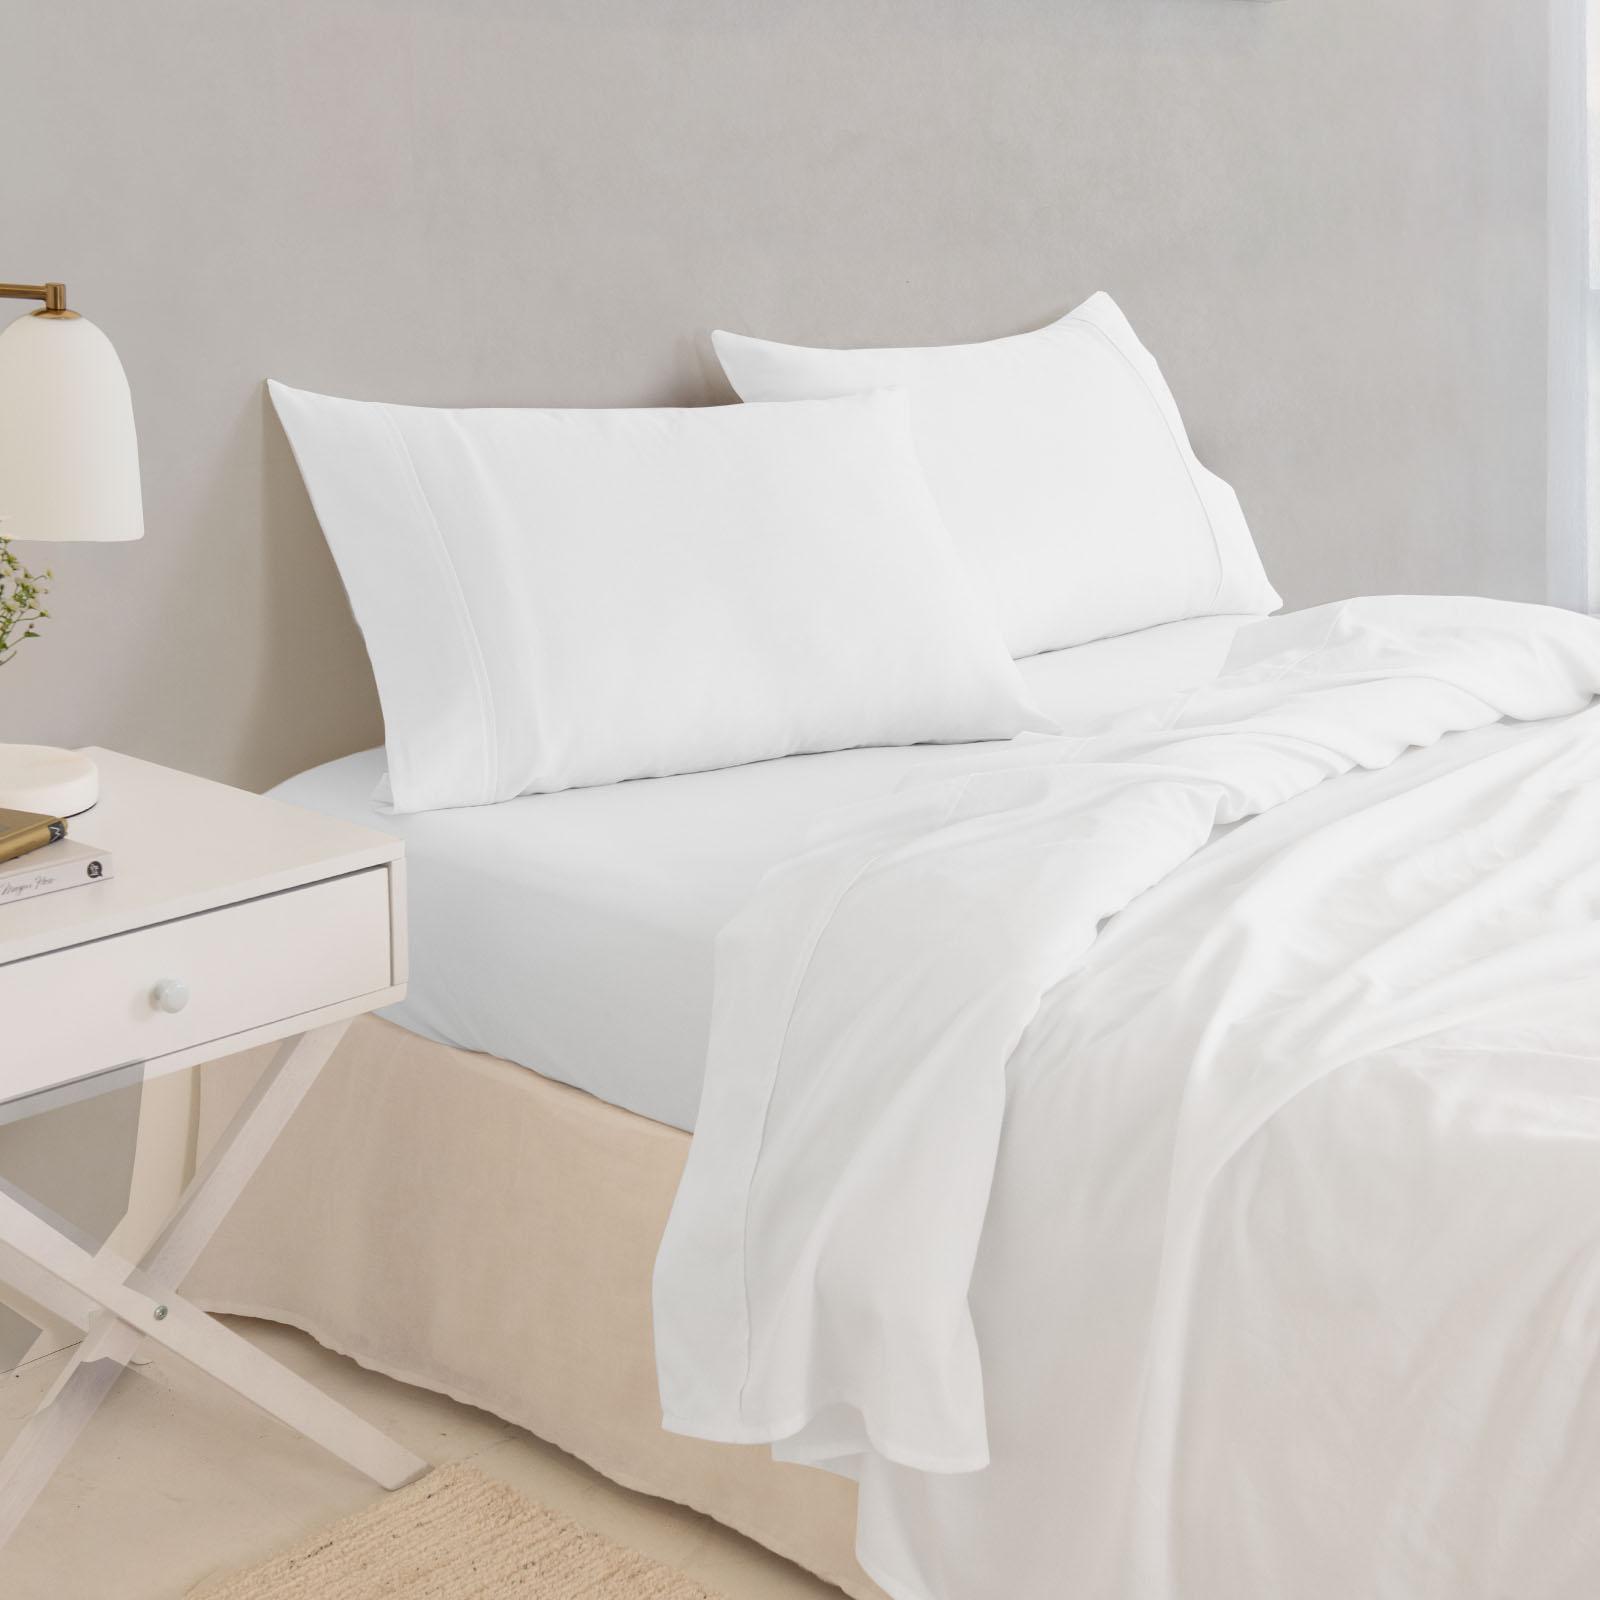 thumbnail 75 - Royal Comfort 1000TC Hotel Grade Bamboo Cotton Sheets Pillowcases Set Ultrasoft